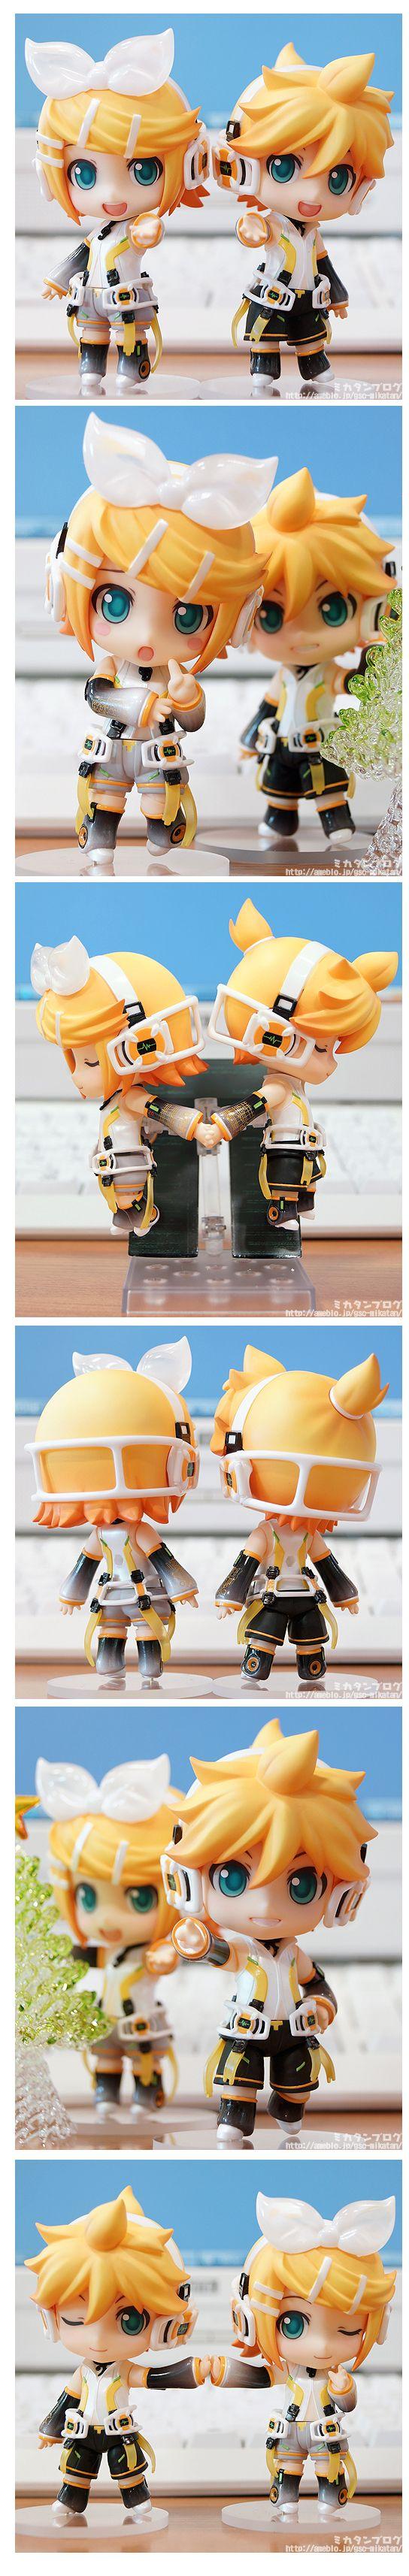 Nendoroid Kagamine Rin & Len: Append Preview